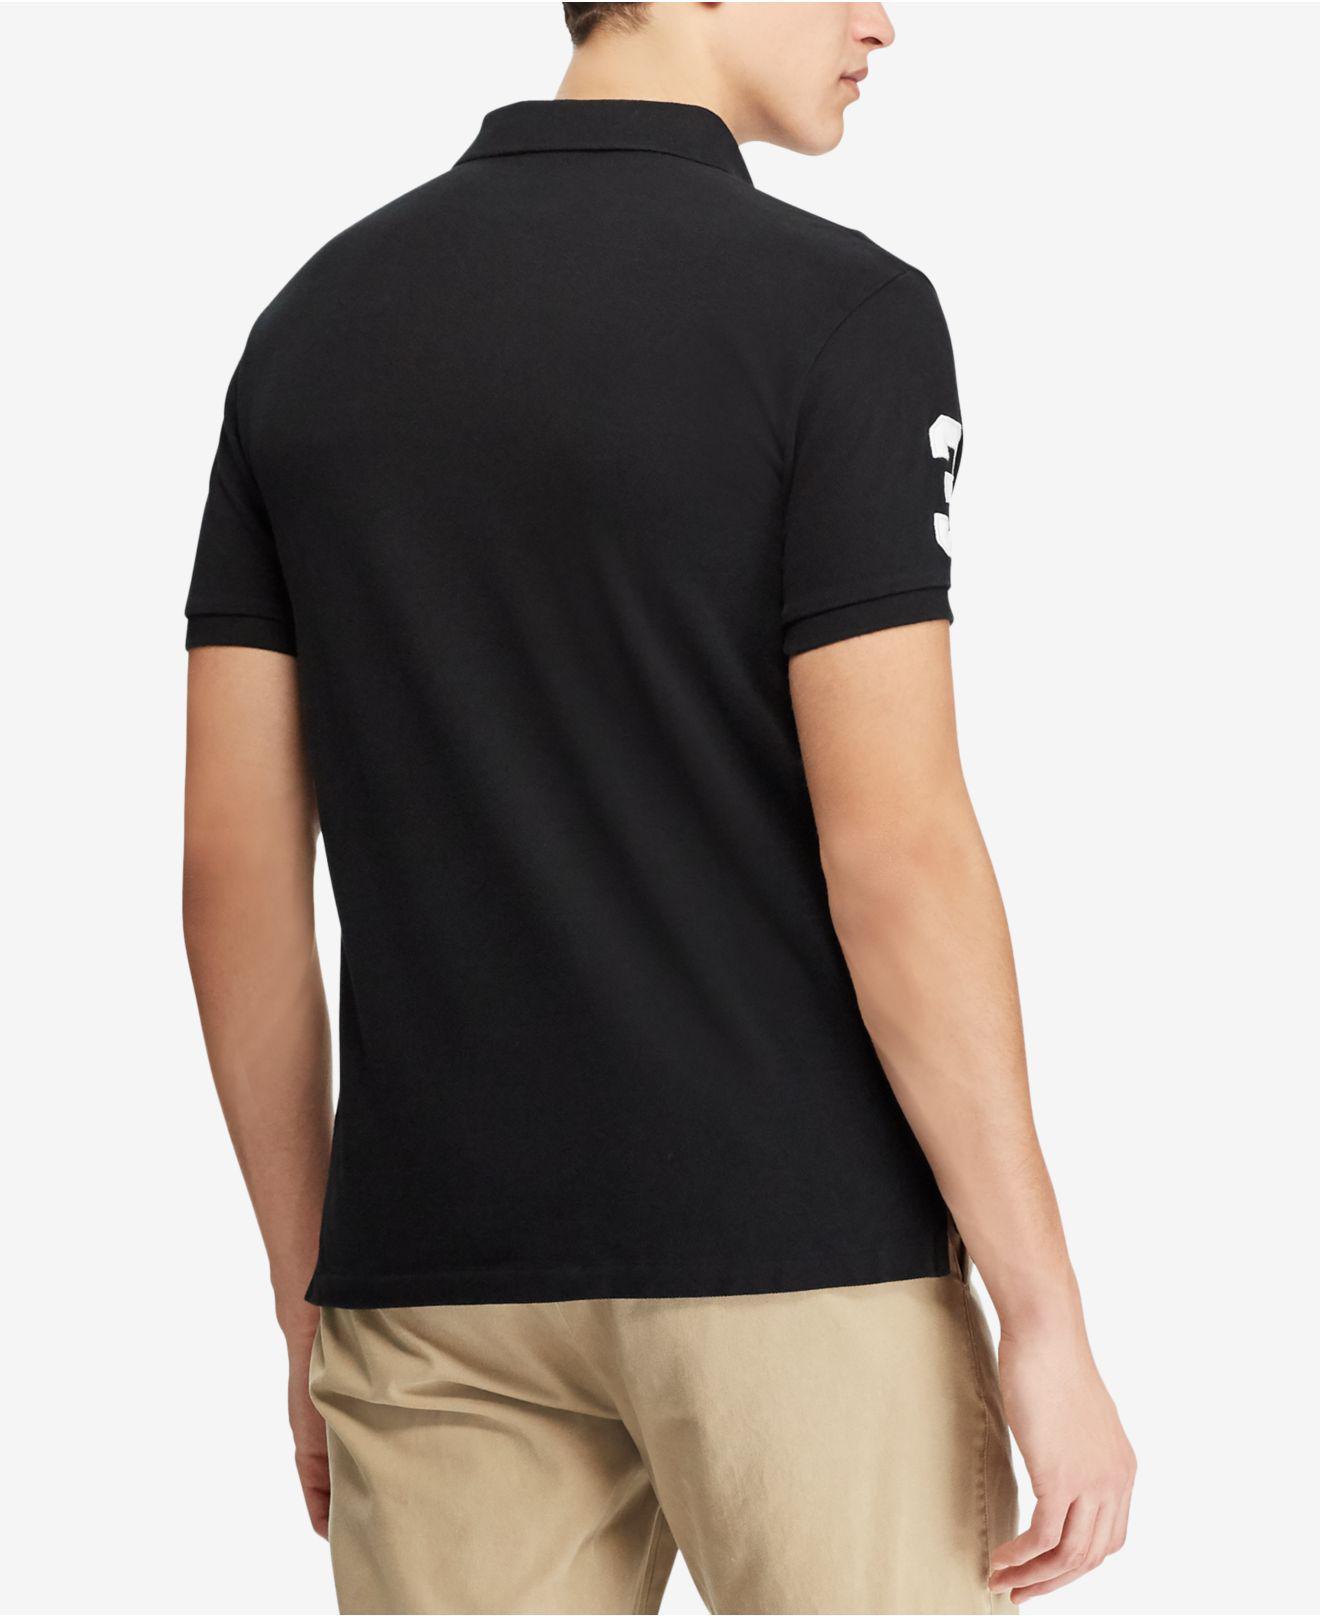 2ebbd8e5 Lyst - Polo Ralph Lauren Custom Slim Fit Polo Shirt in Black for Men - Save  45%